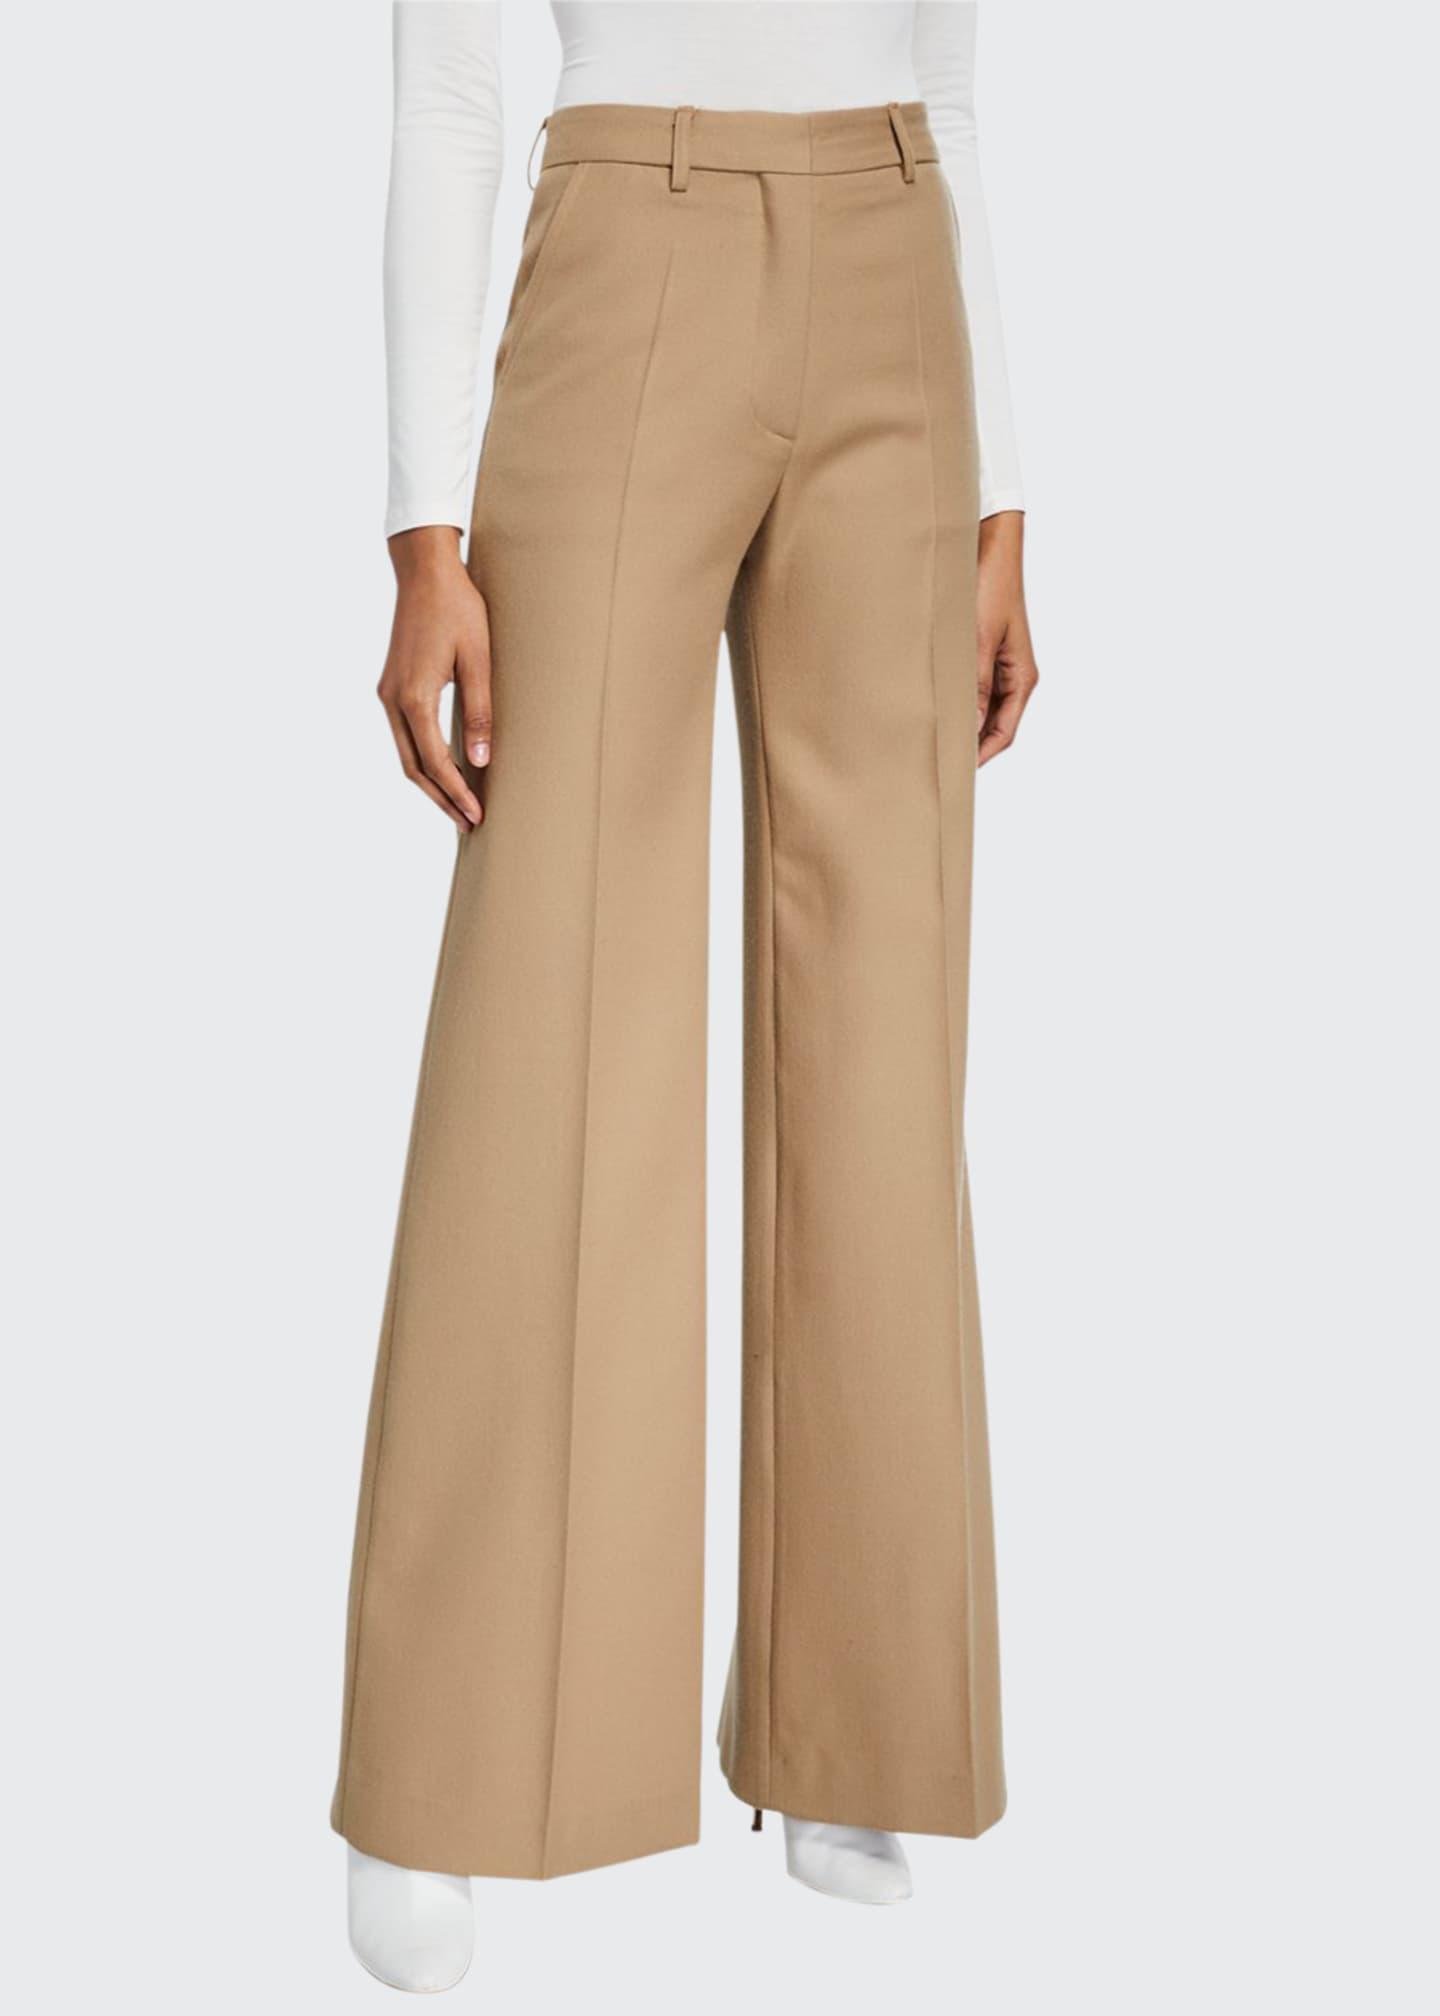 Boon The Shop Wool-Blend Flare-Leg Pants